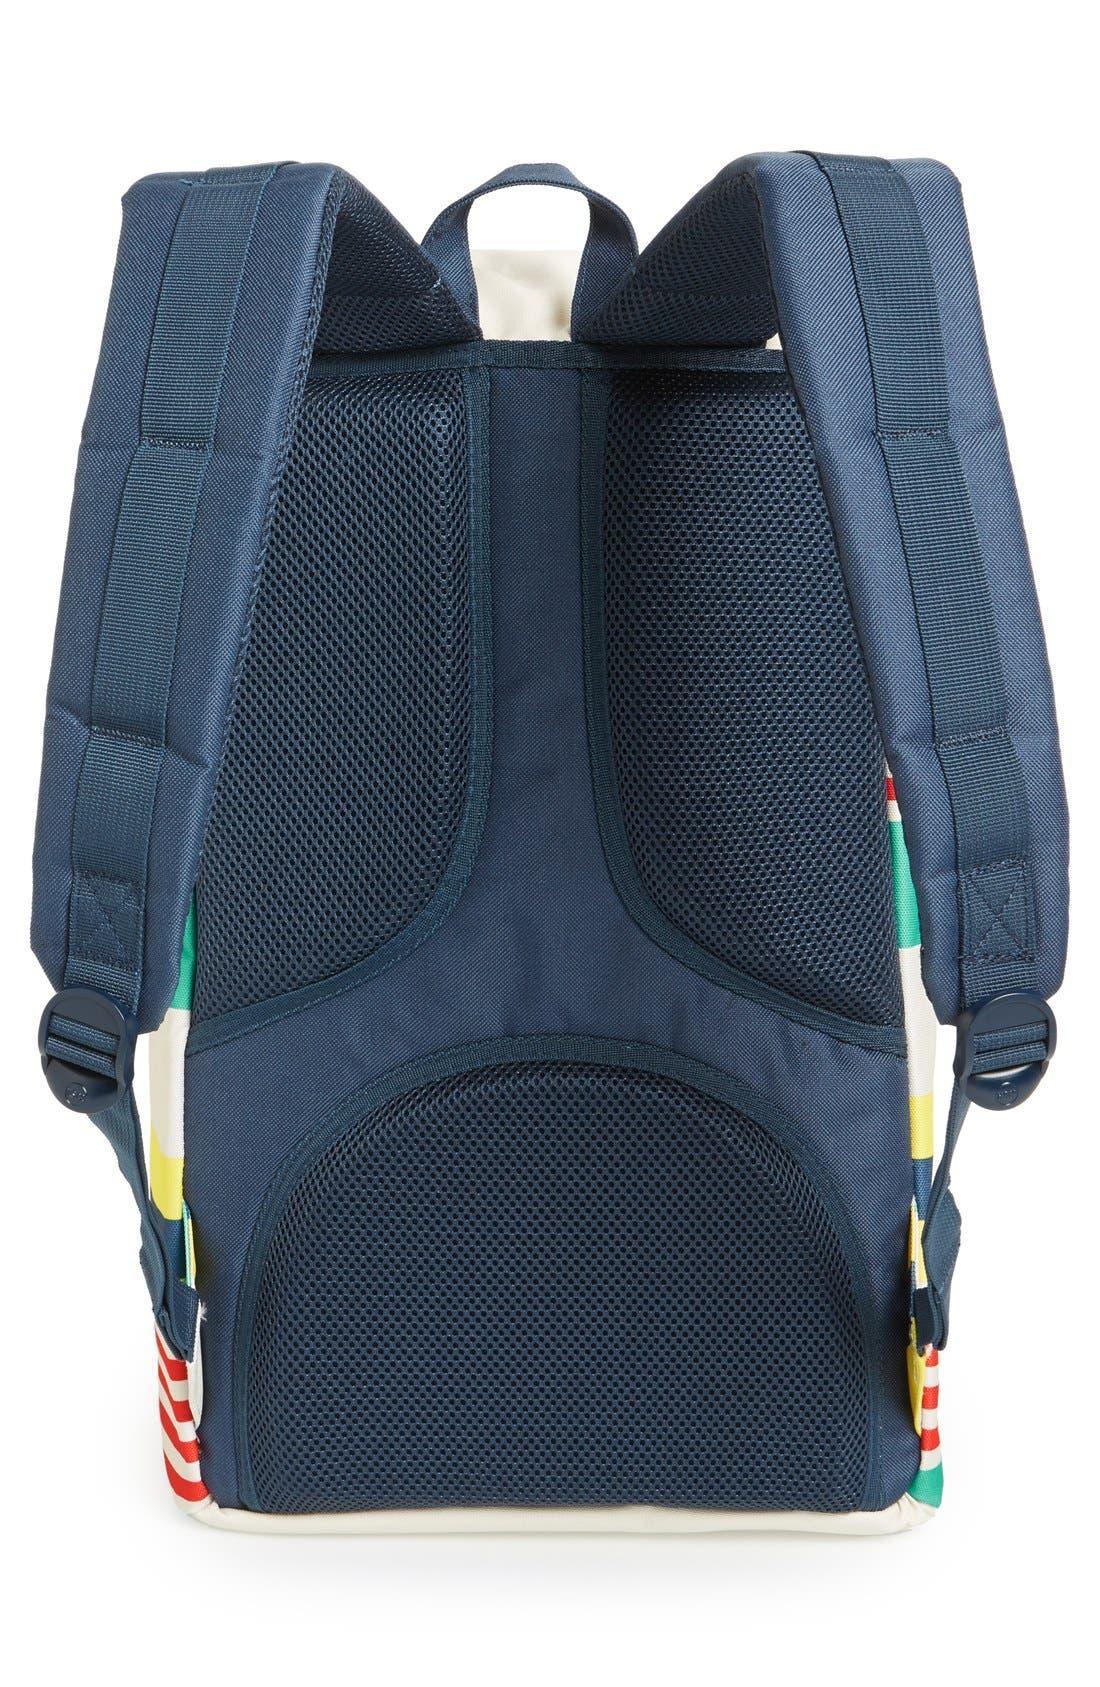 Alternate Image 2  - Herschel Supply Co. 'Little America - Malibu' Backpack